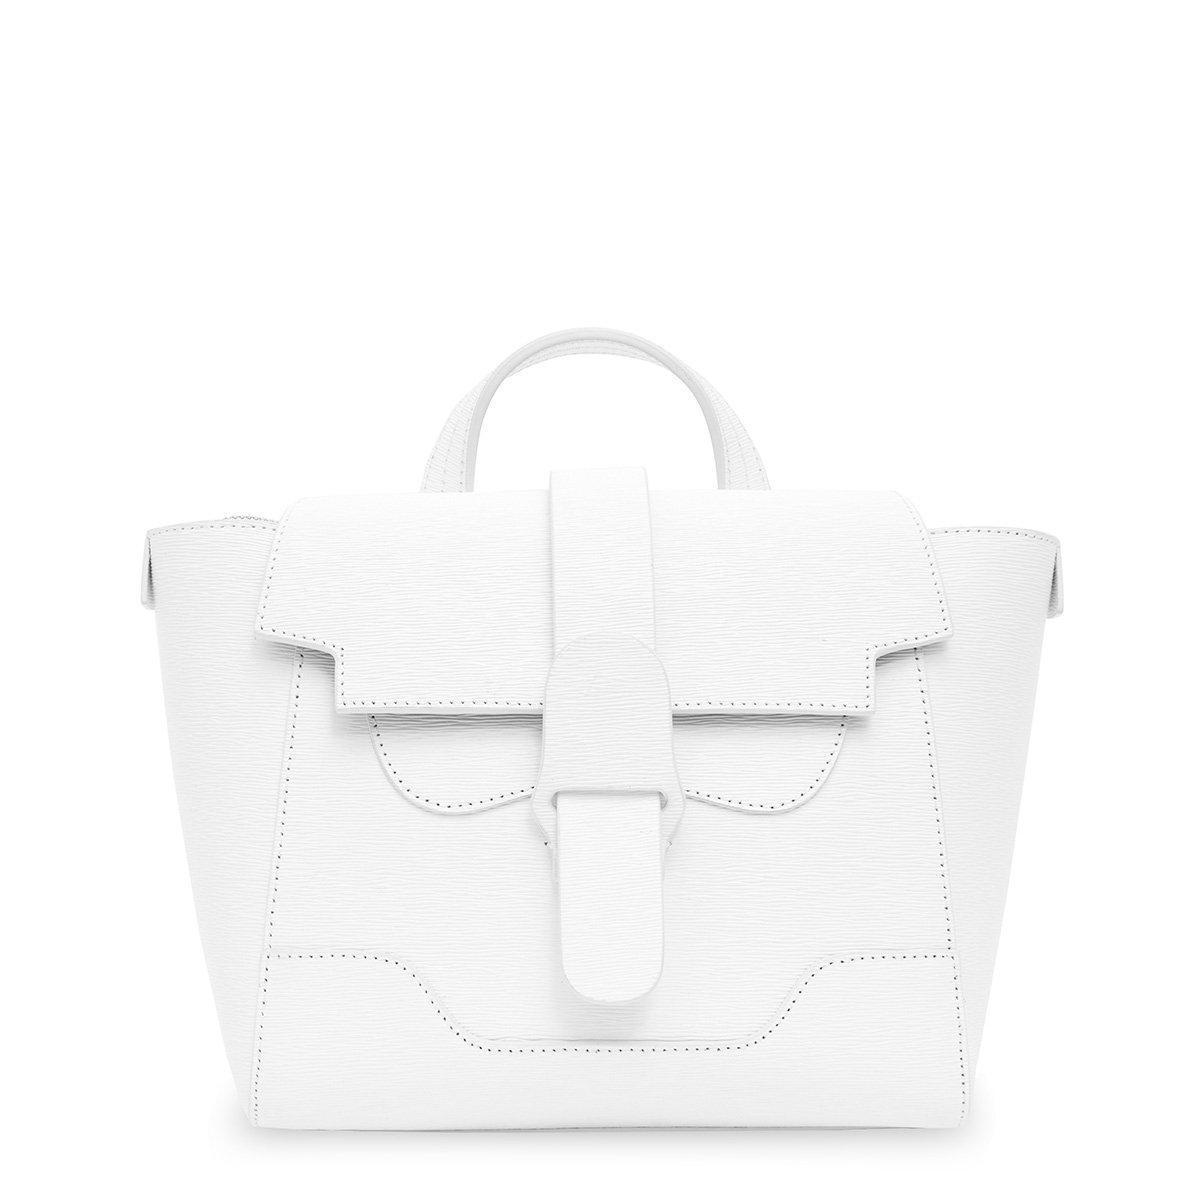 Senreve The Mini Maestra Bag In Blanc